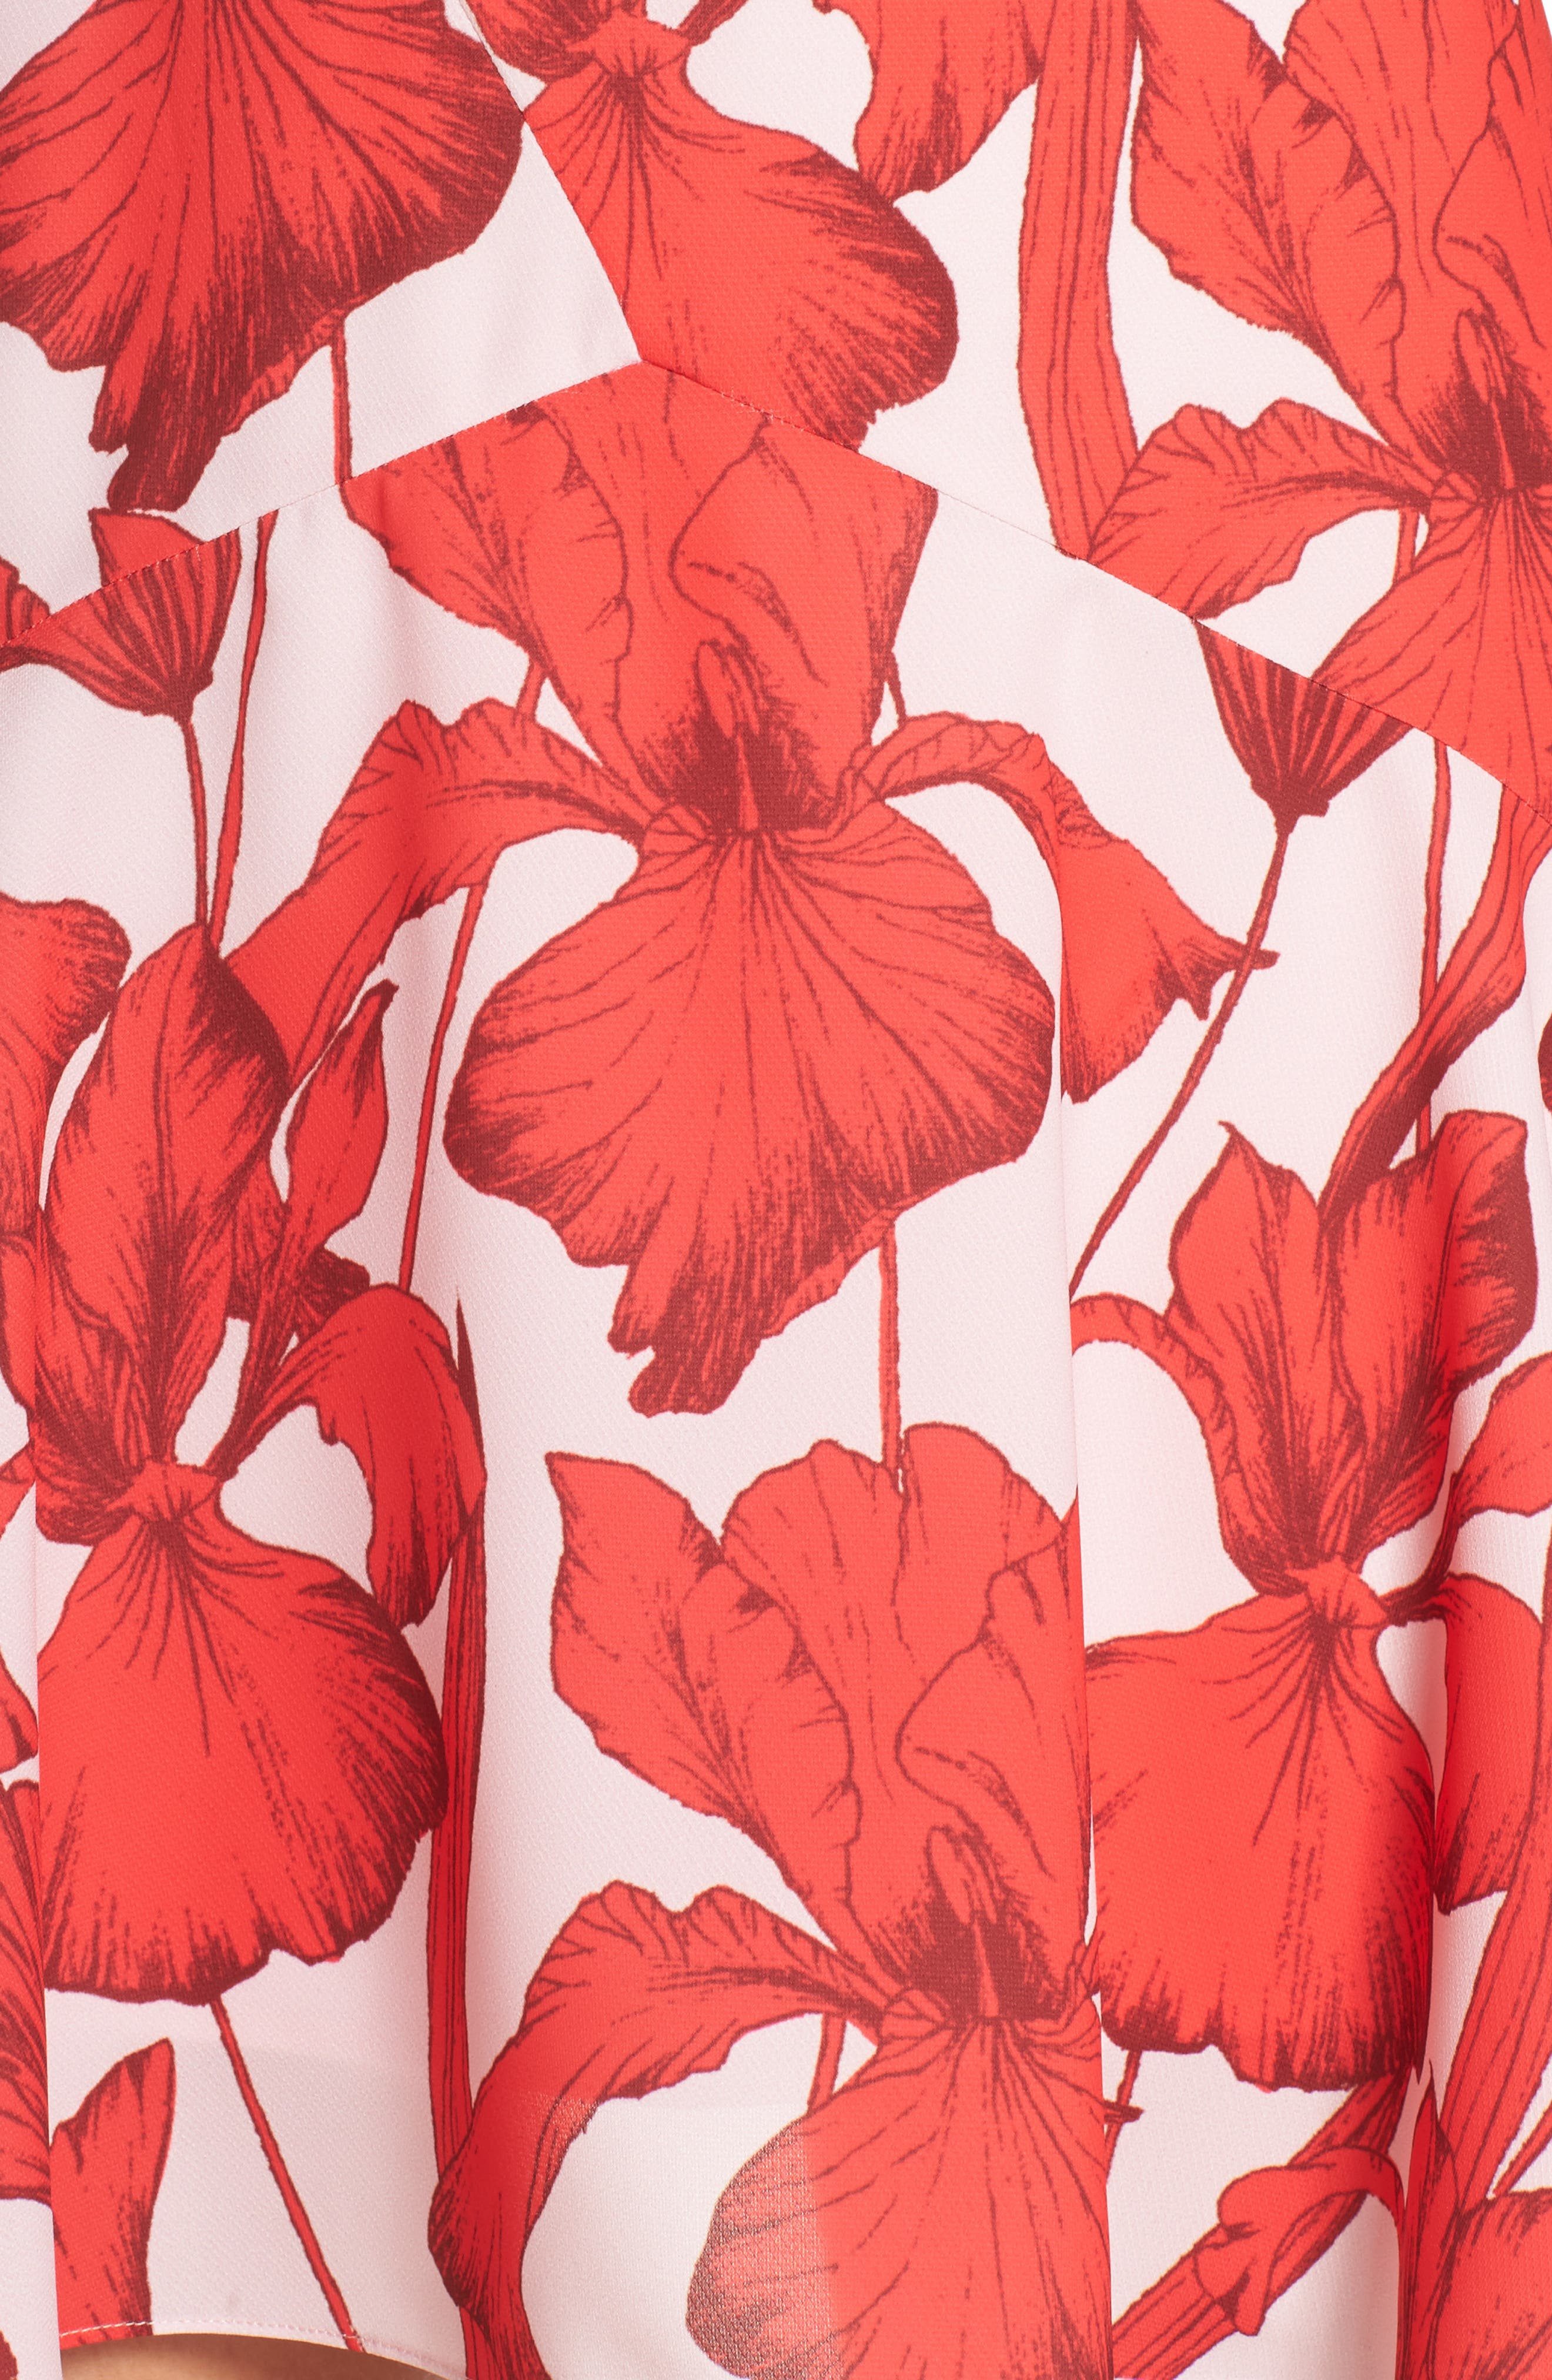 Iris Print Surplice Minidress,                             Alternate thumbnail 5, color,                             Pink Red Iris Floral